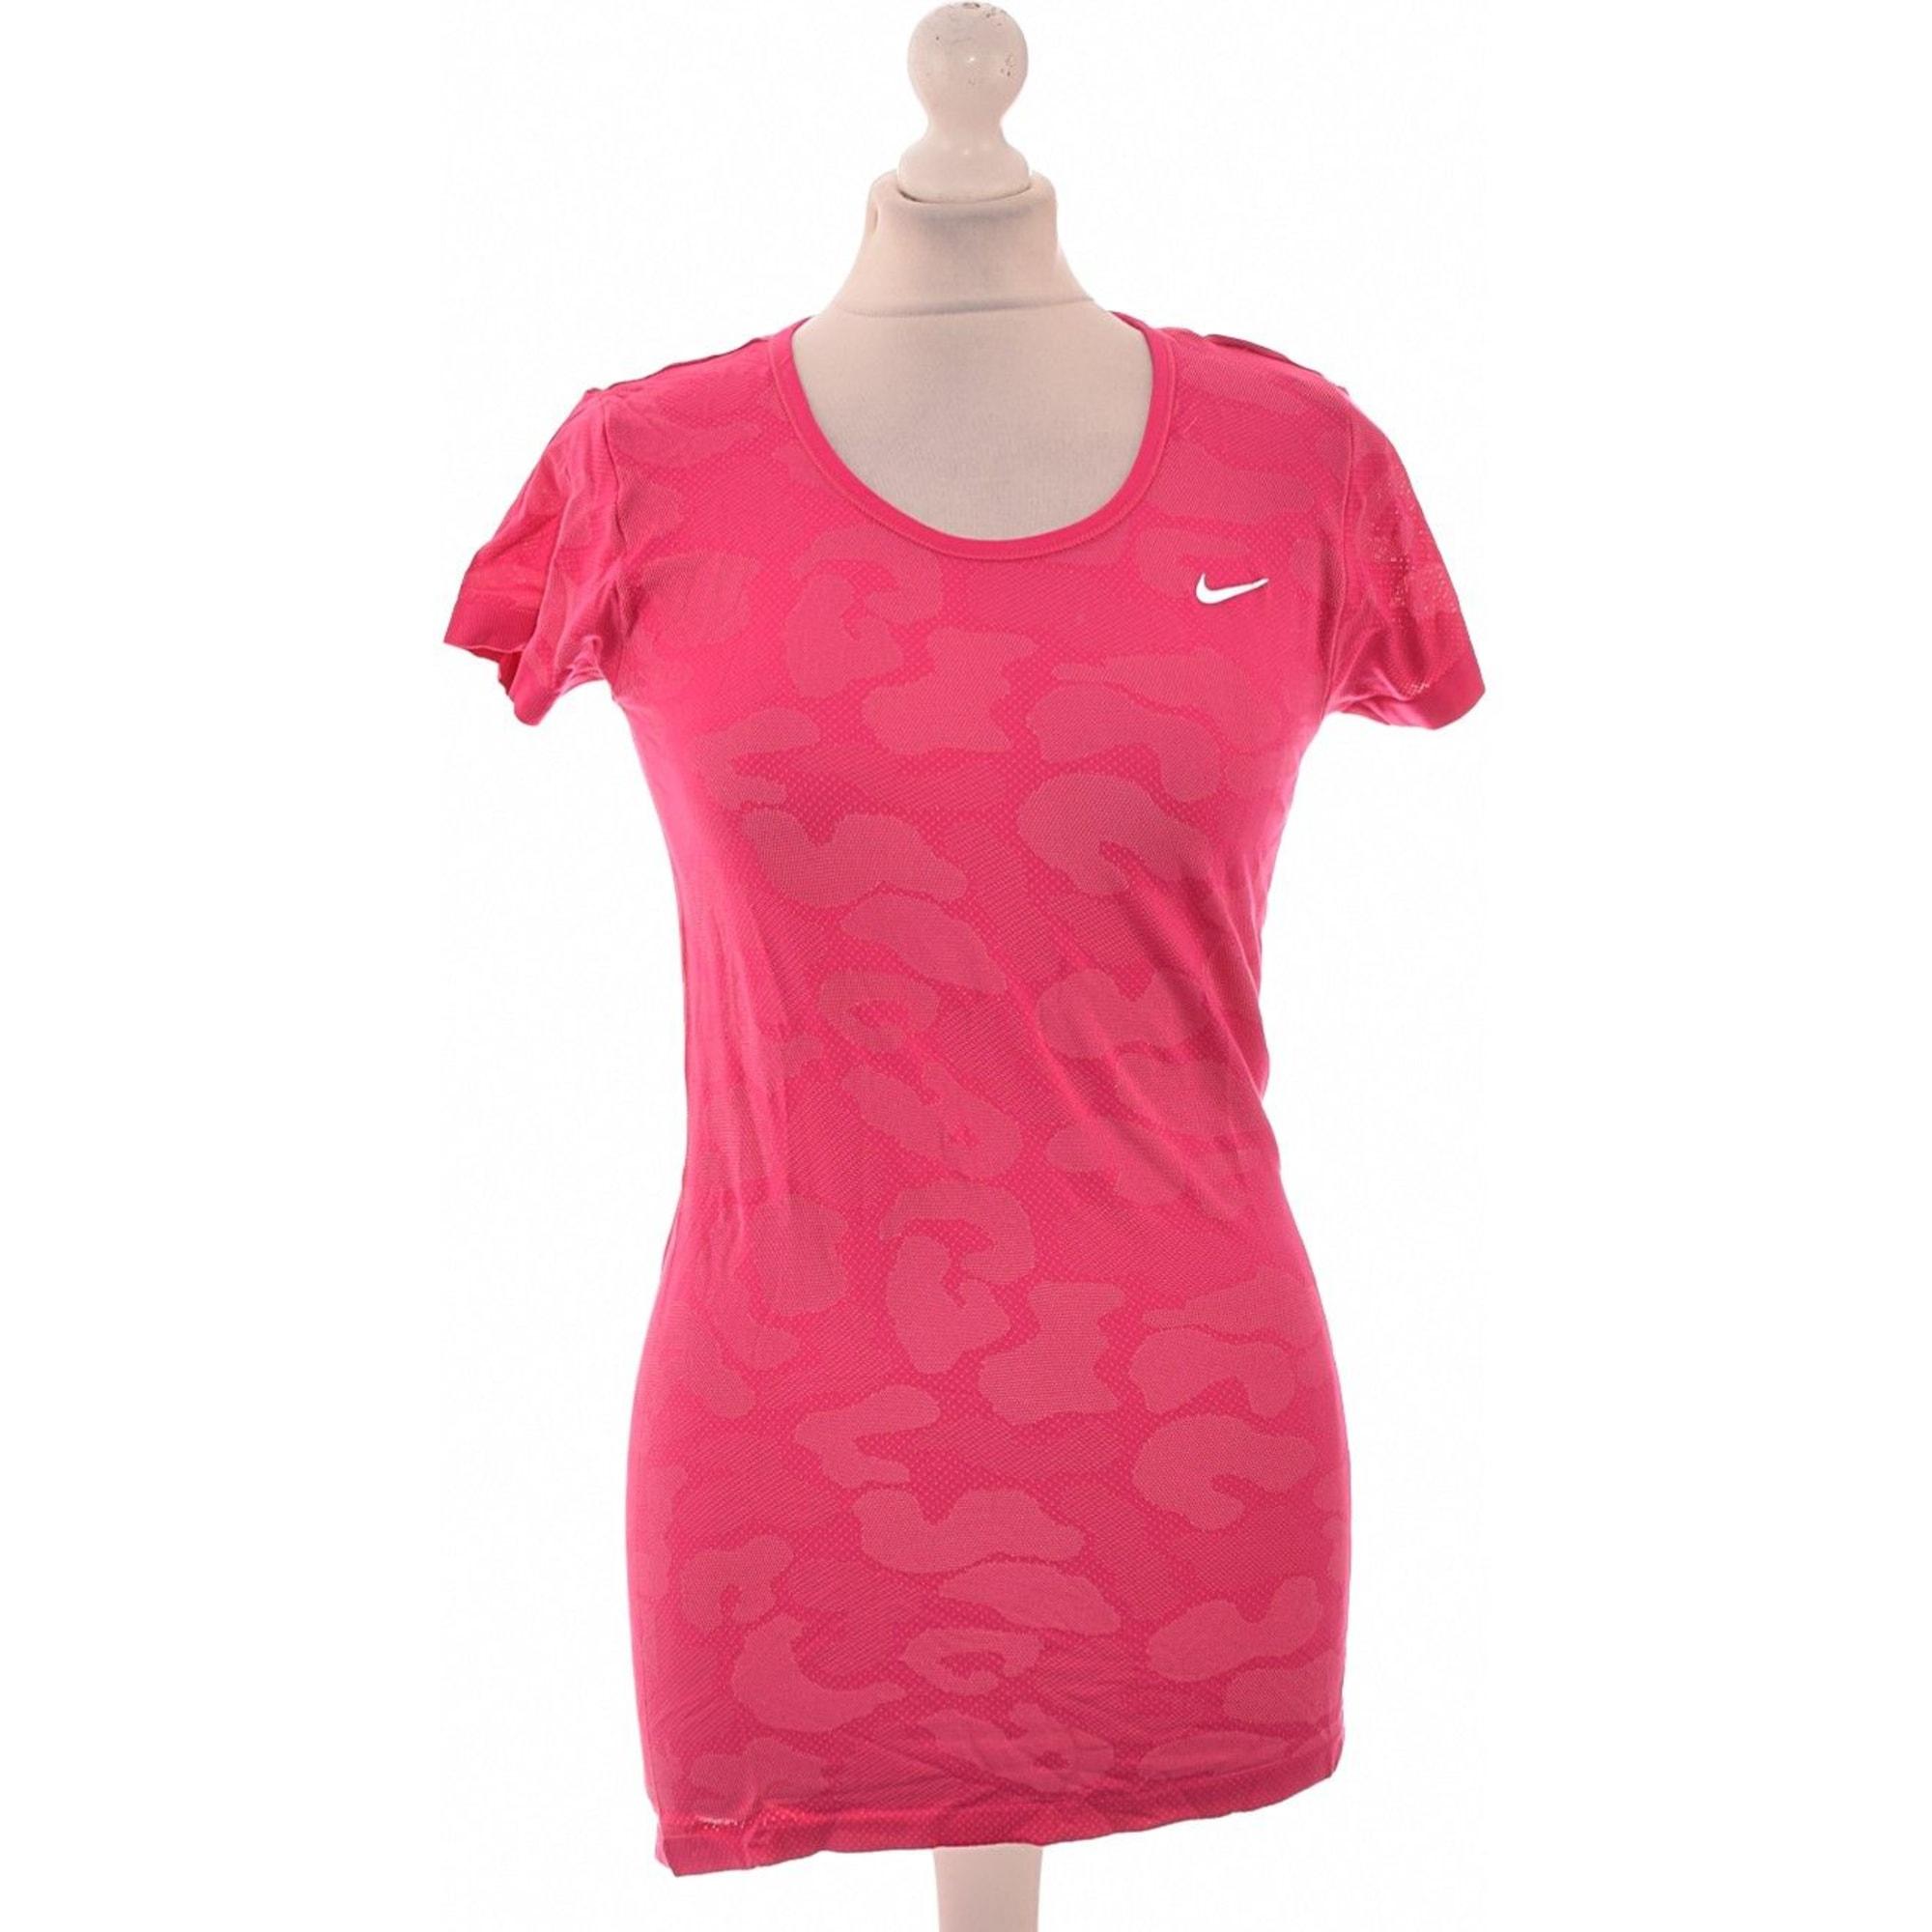 Top, tee-shirt NIKE Rose, fuschia, vieux rose